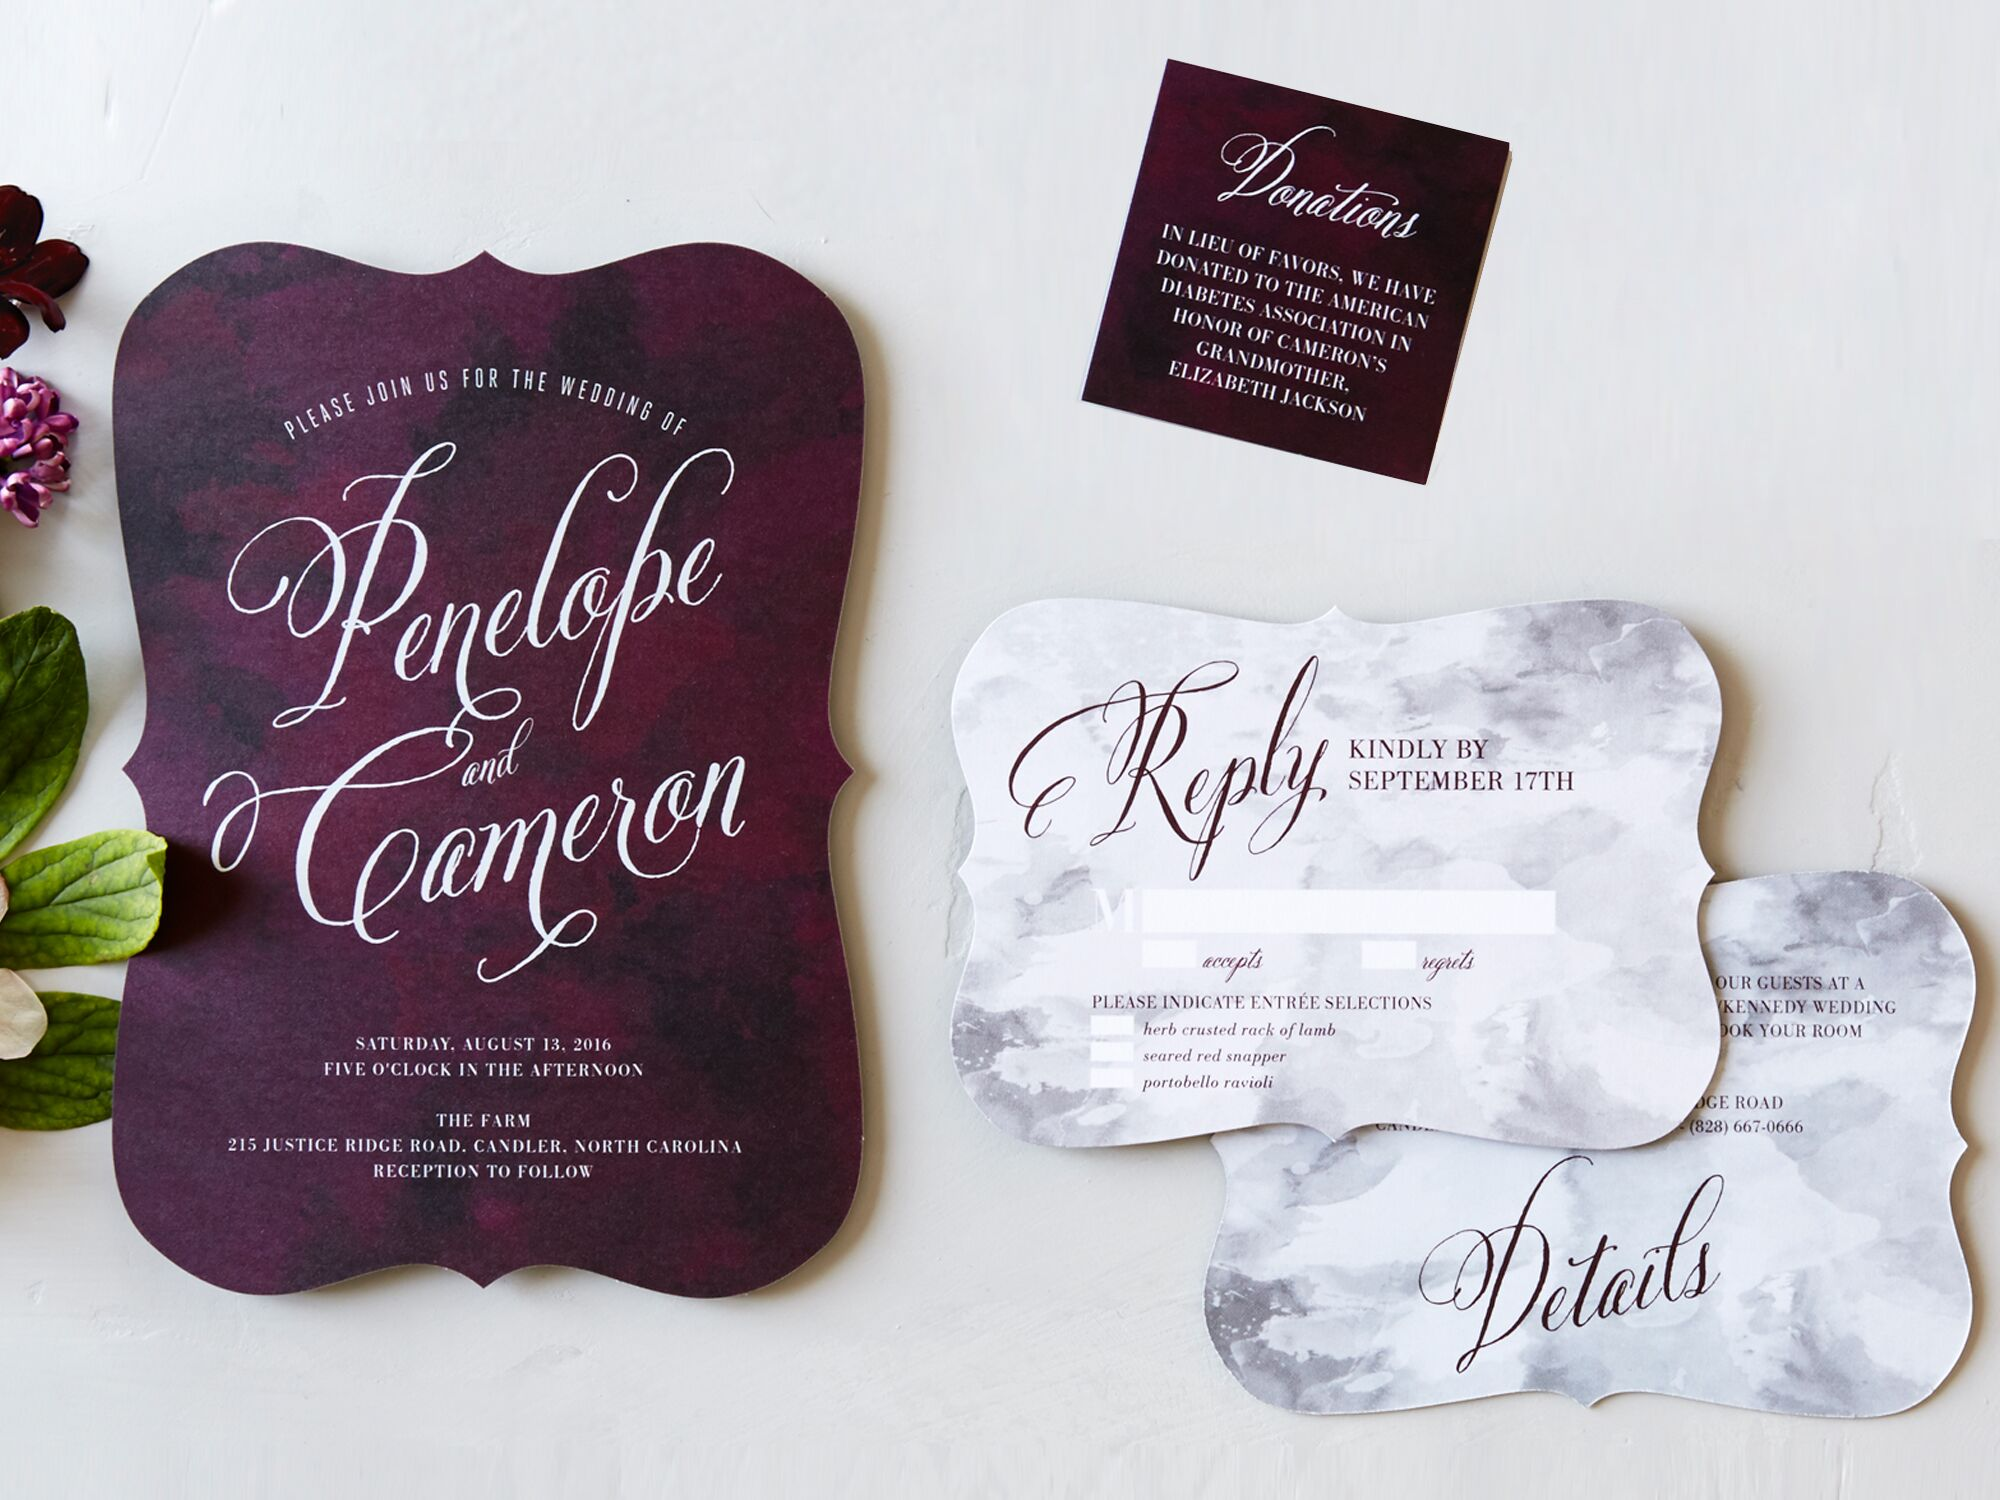 New Wedding Invitation Ideas: 8 Hot Wedding Invitation Trends